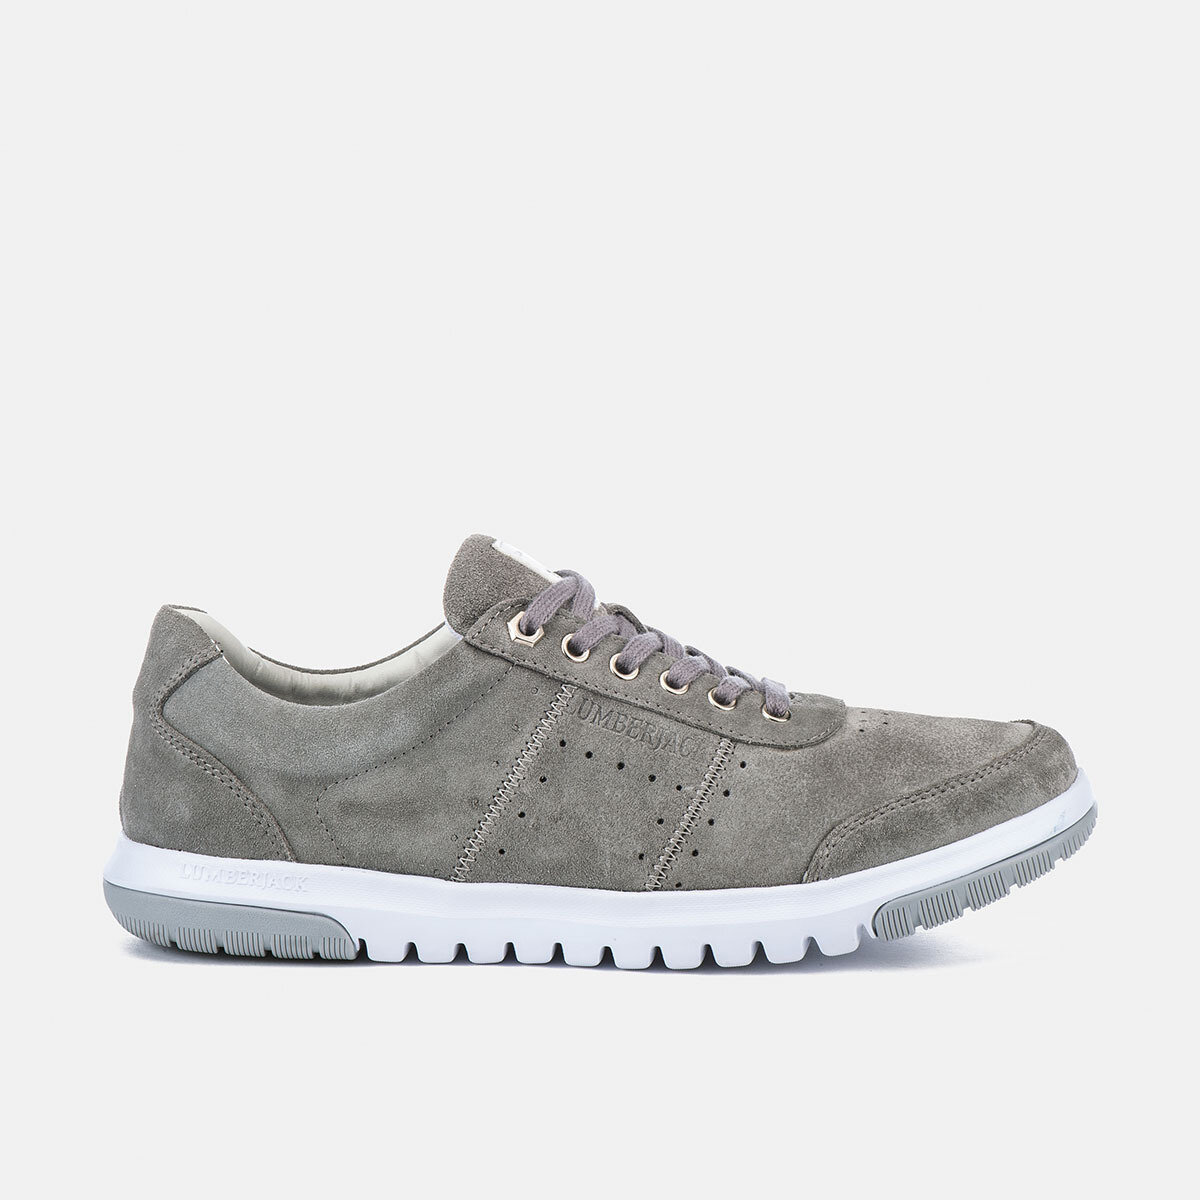 OTIS CIMENT GREY Man Sneakers